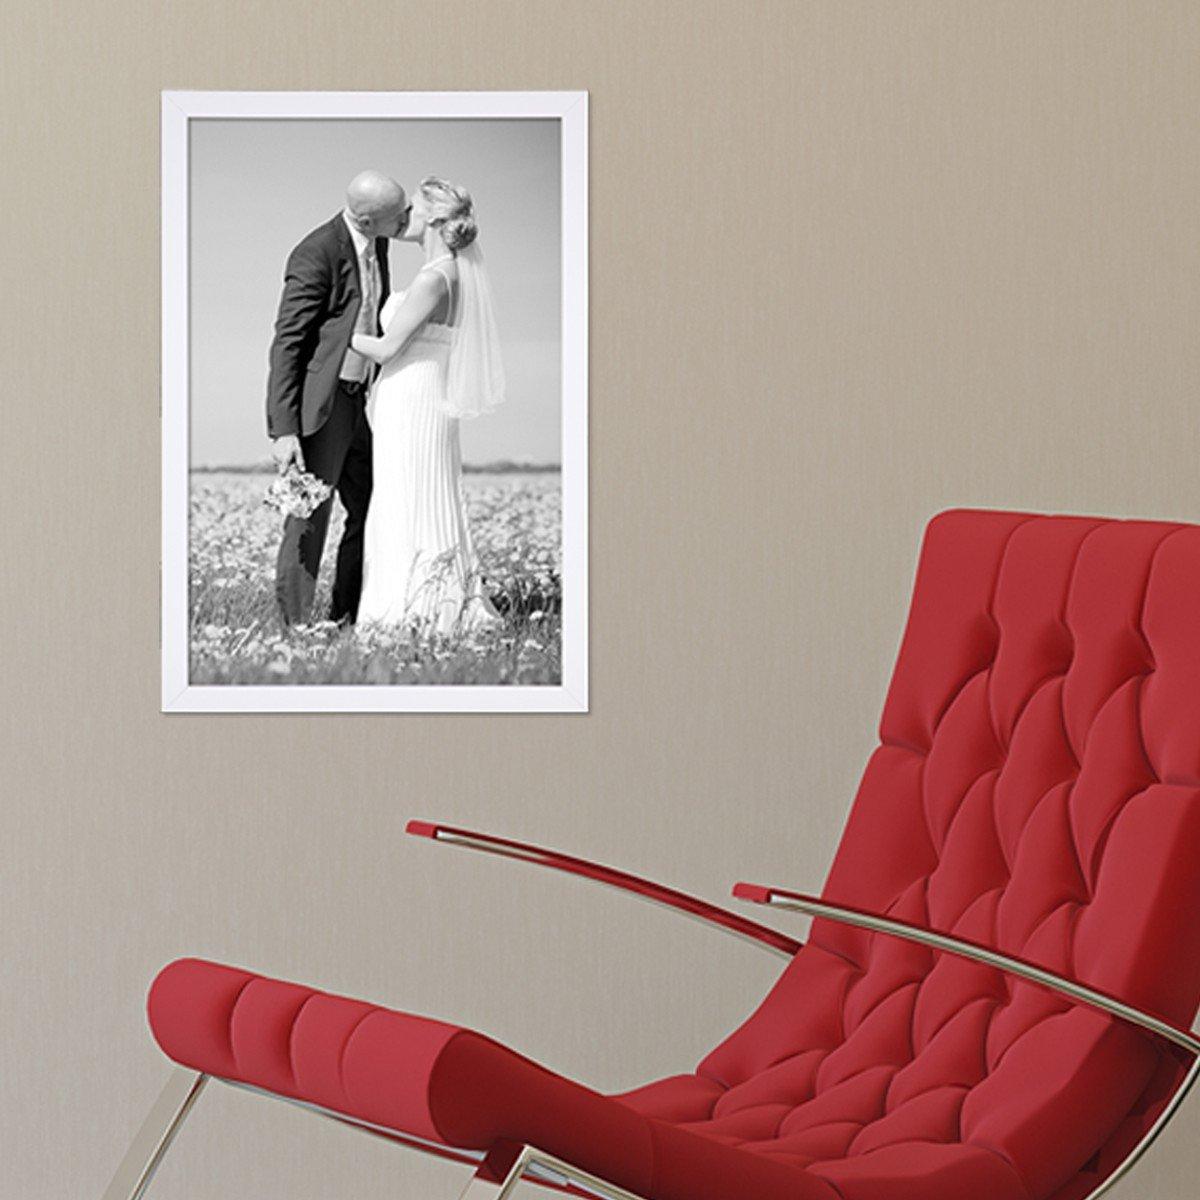 Amazon.de: PHOTOLINI Bilderrahmen 30x42 cm/Din A3 Weiss Modern aus ...